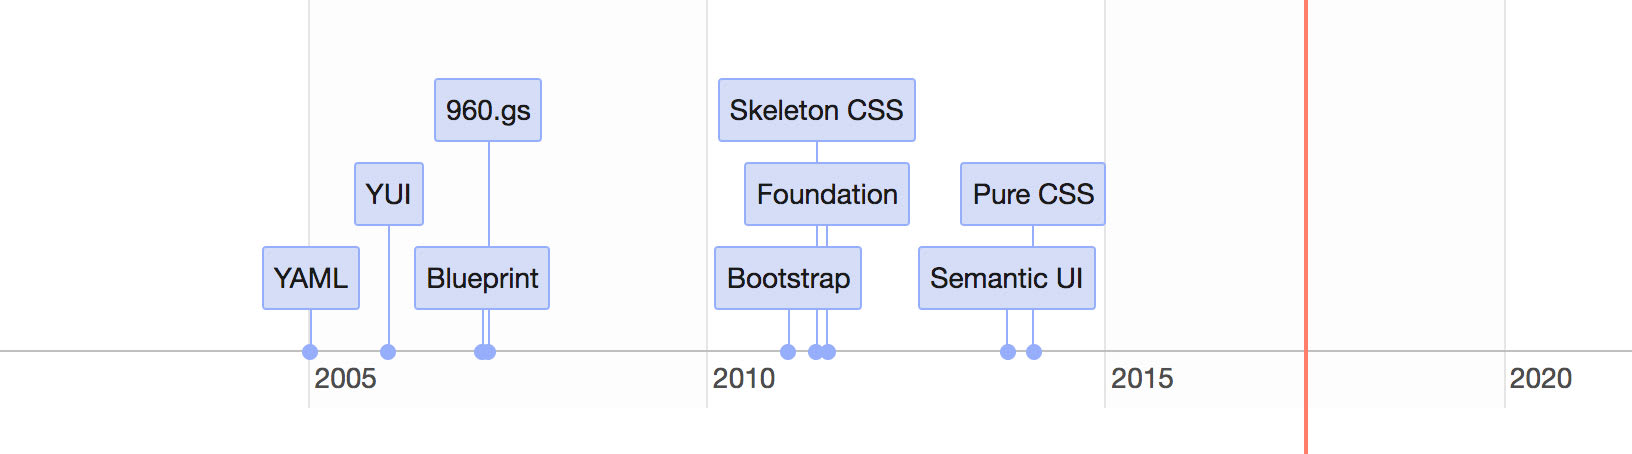 CSS framework history